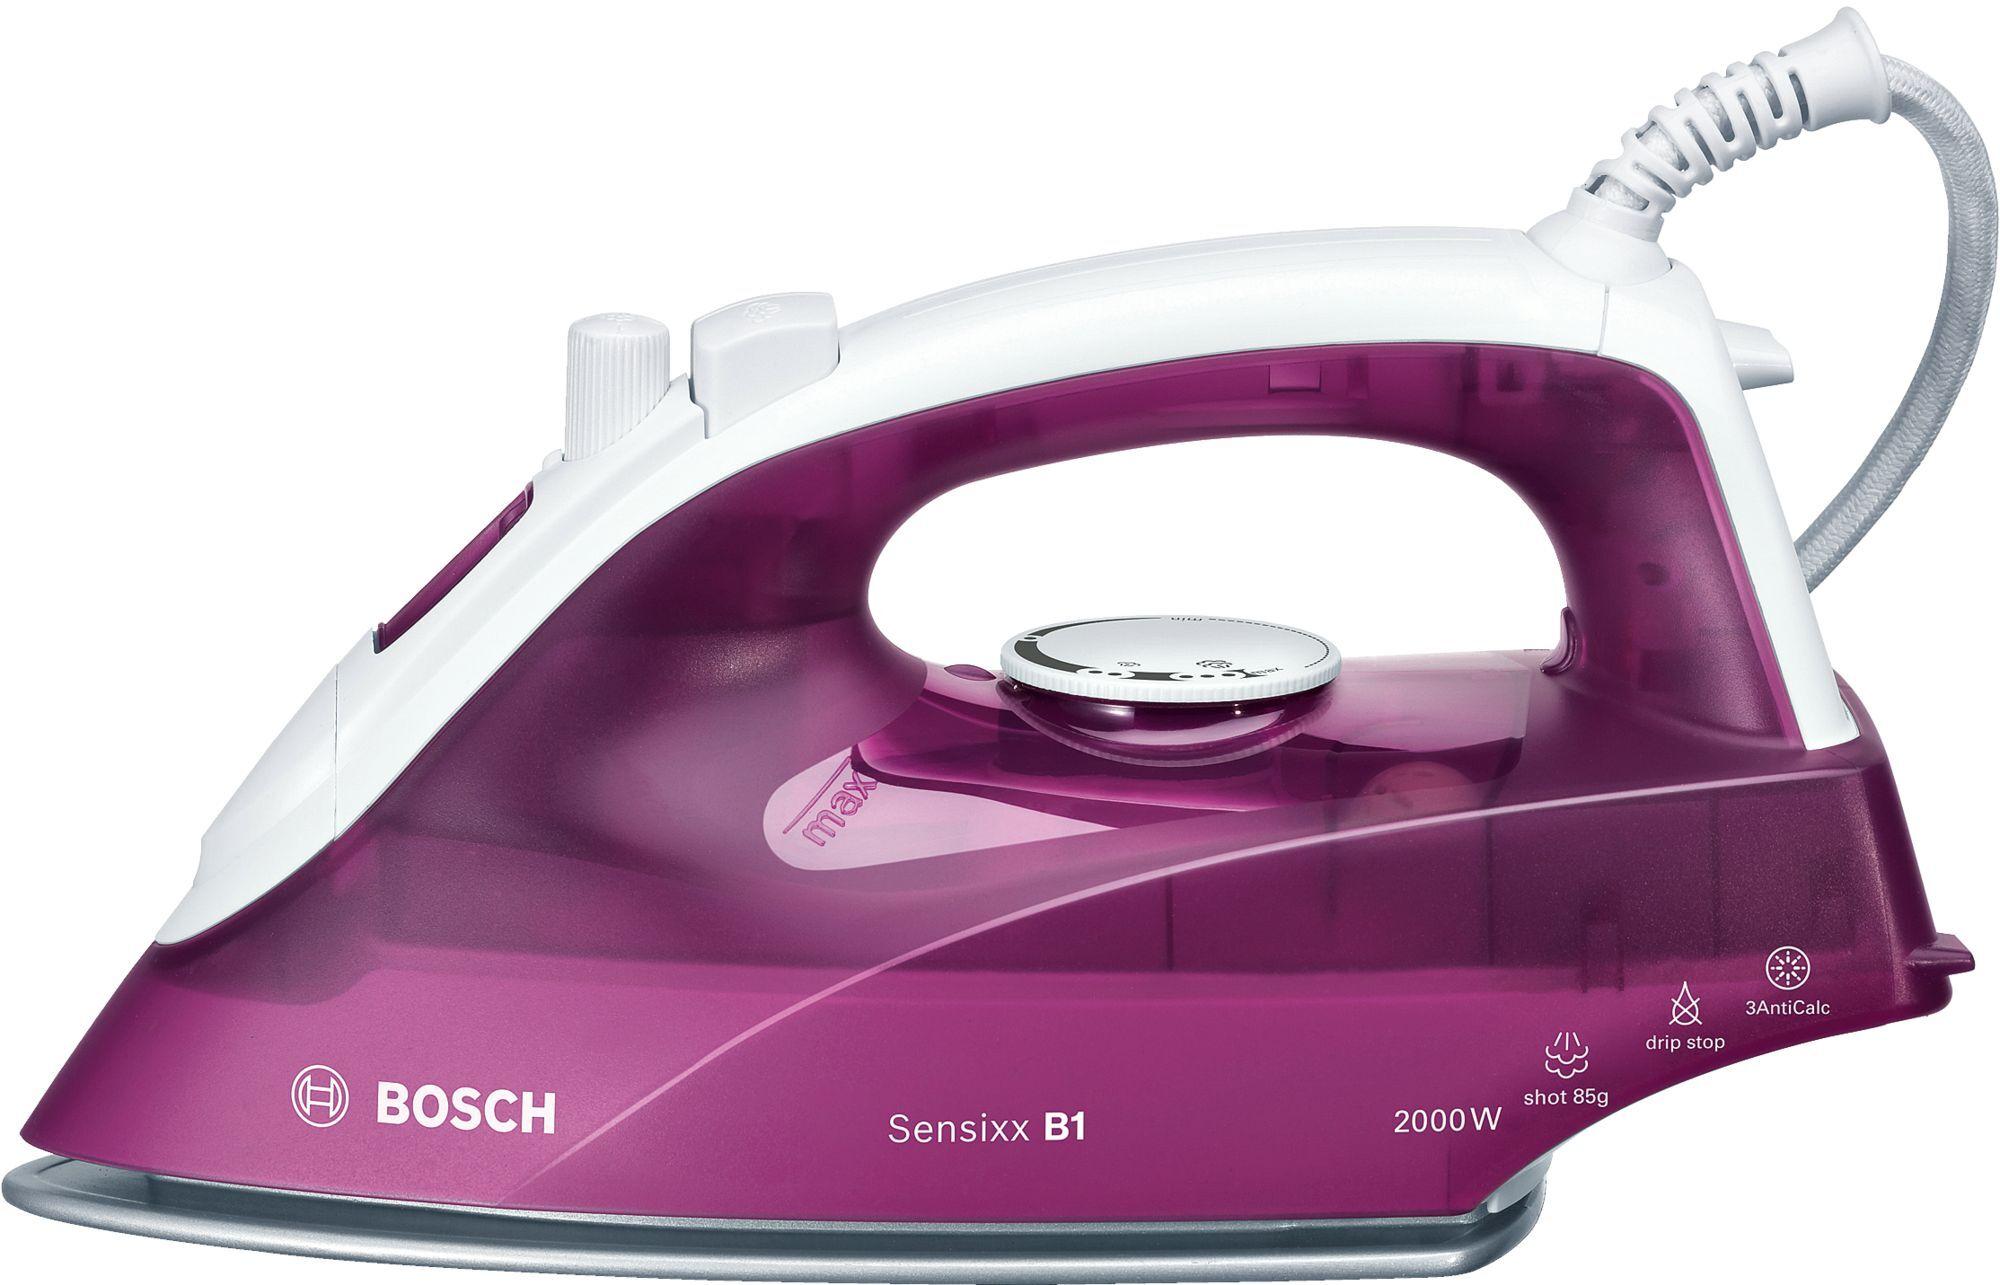 Bosch Sensixx B1 TDA2625GB Steam Iron